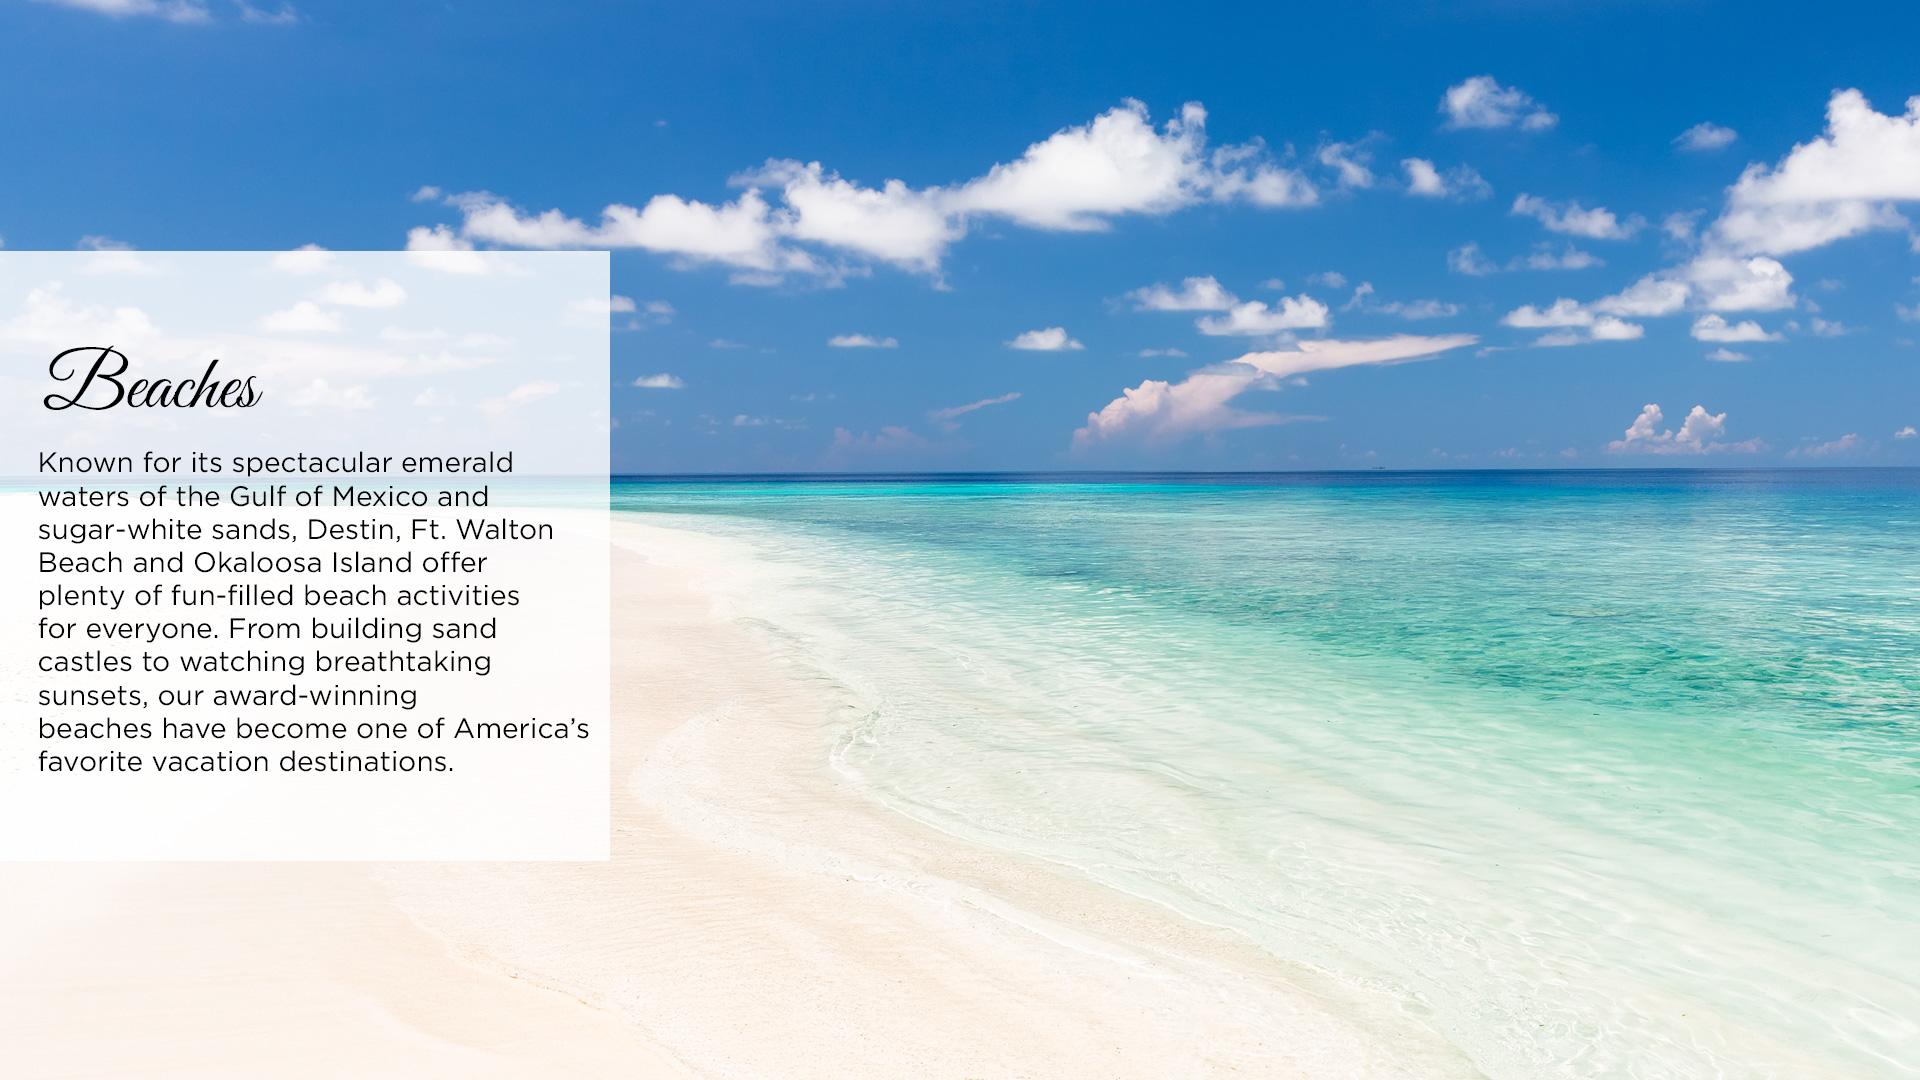 RQRE-blu-1920x1080-April2016-Beaches